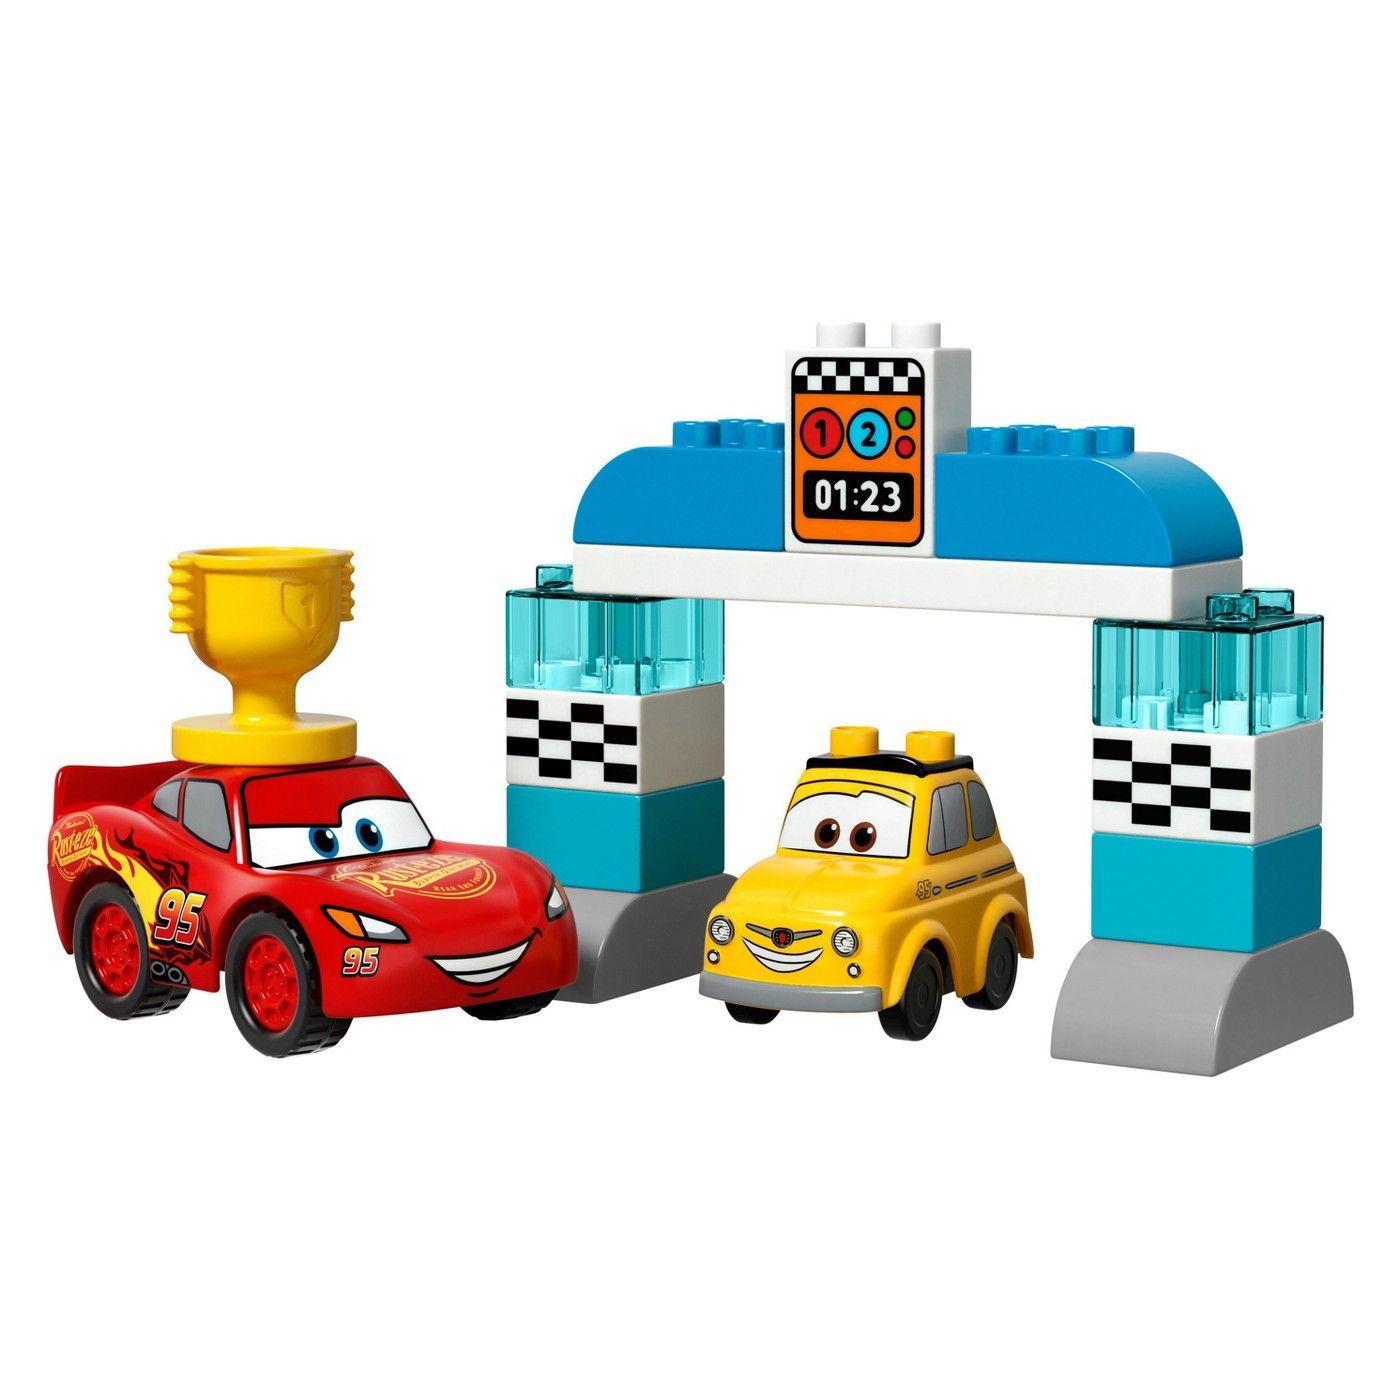 Legoâ Duploâ Disneyâpixarâ20cars 3 Piston Cup Race 10857